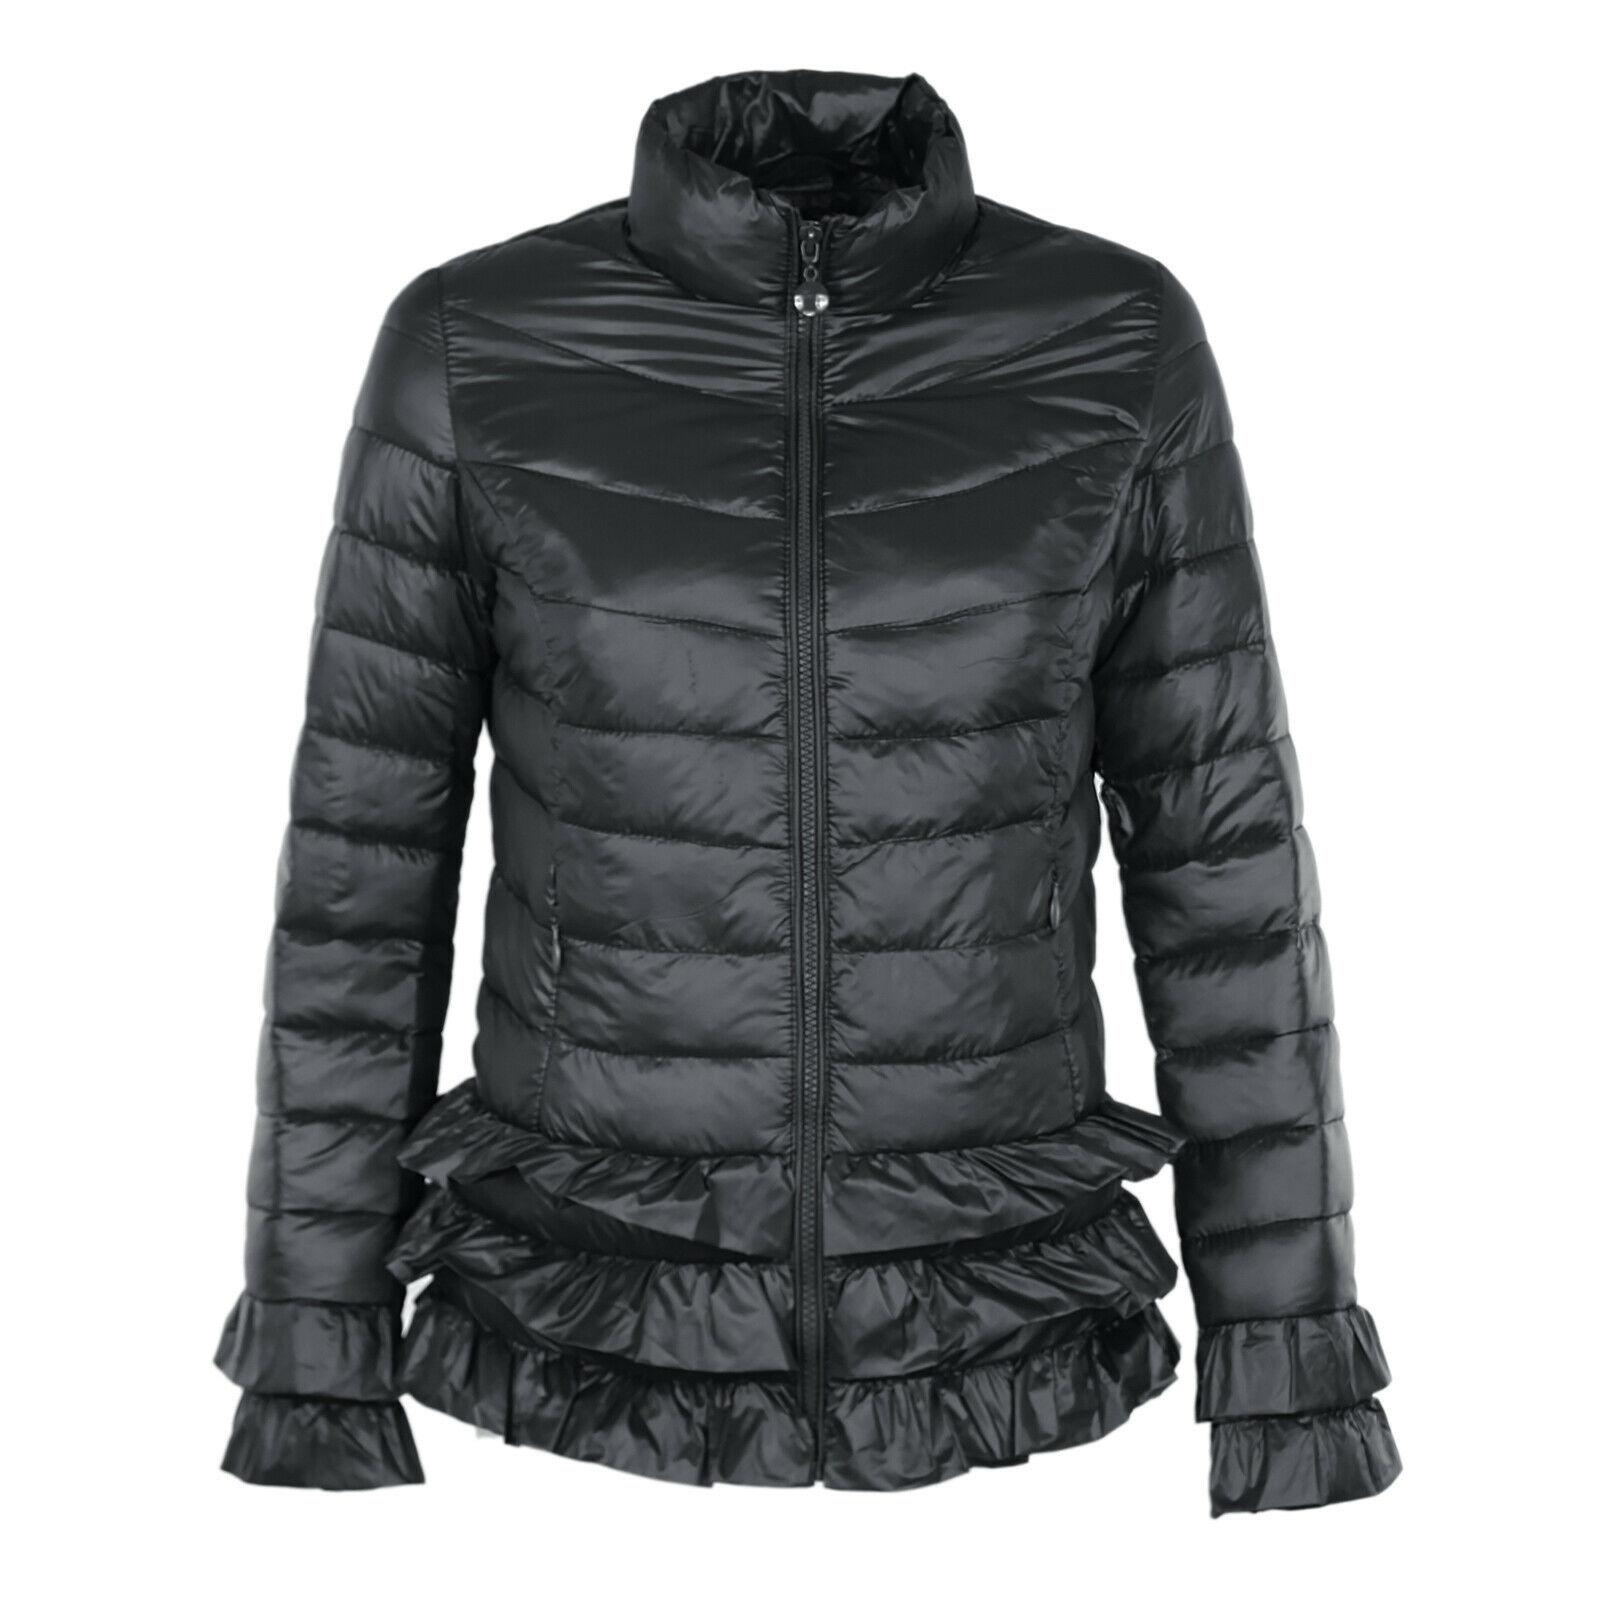 ZOGAA Women's Cotton Parkas Coats Puffer Jacket Parka Women Fashion Slim Fit Solid Coat Outwear Women Parkas Plus Size S-XXL